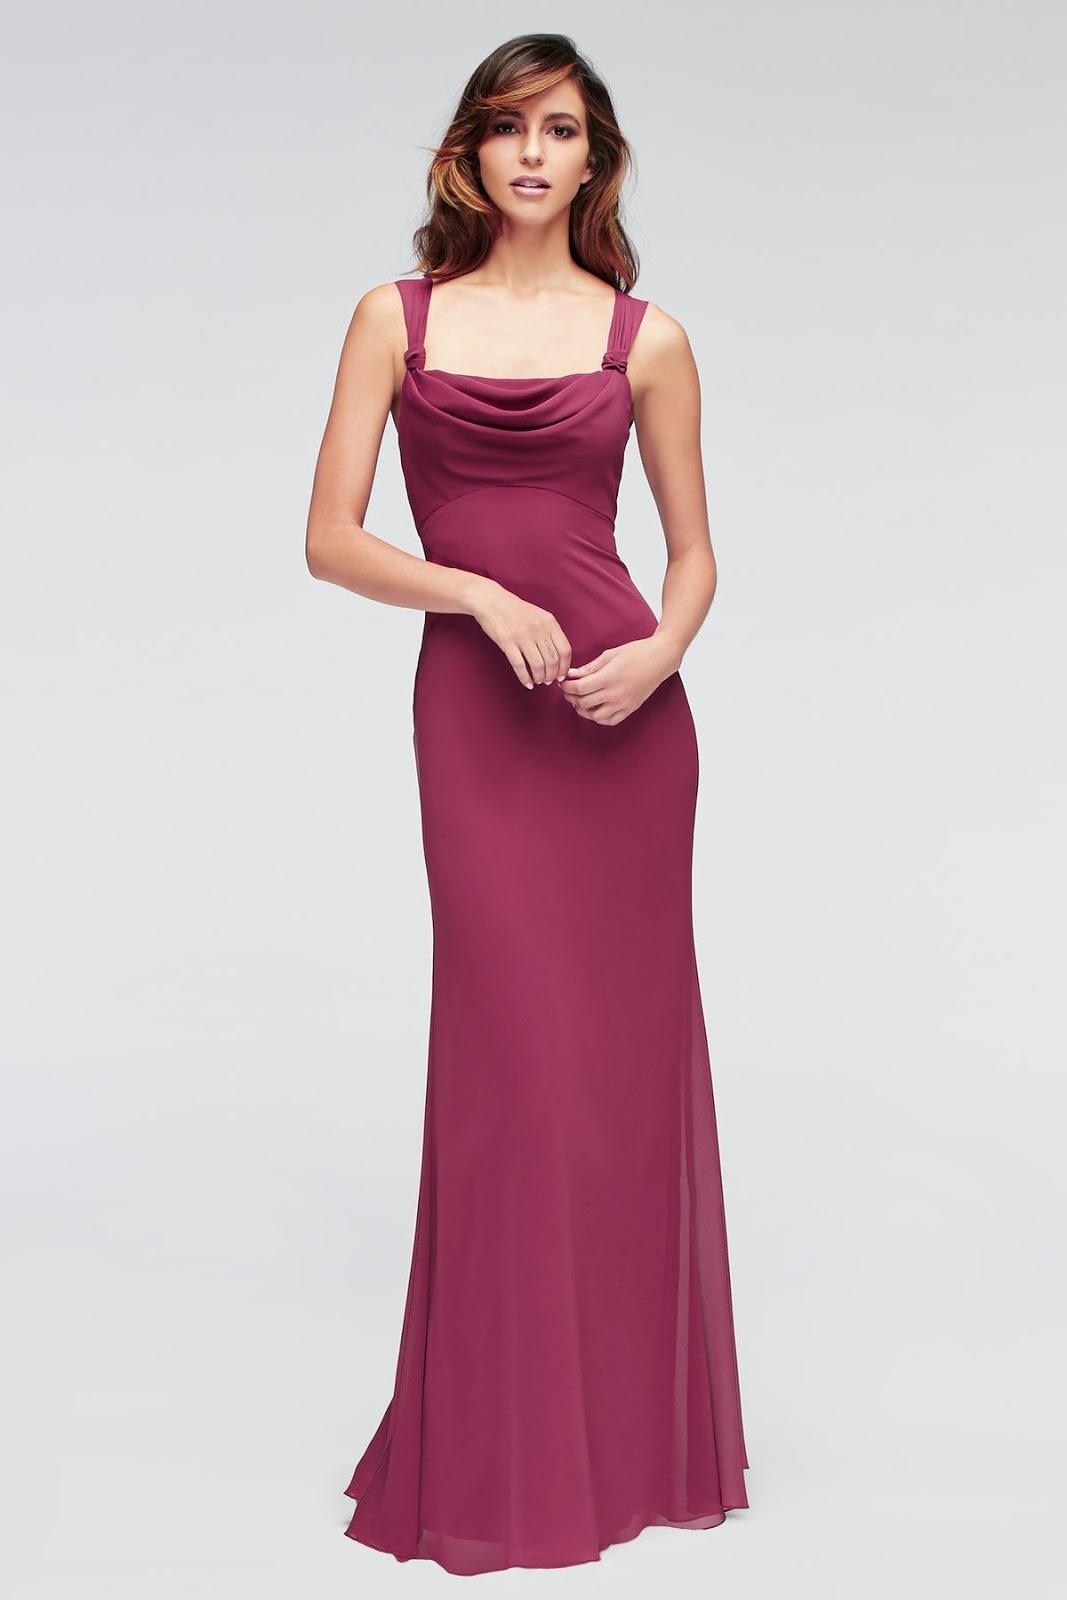 Miss ruby boutique new arrivals bridesmaid dresses watters alder ombrellifo Choice Image